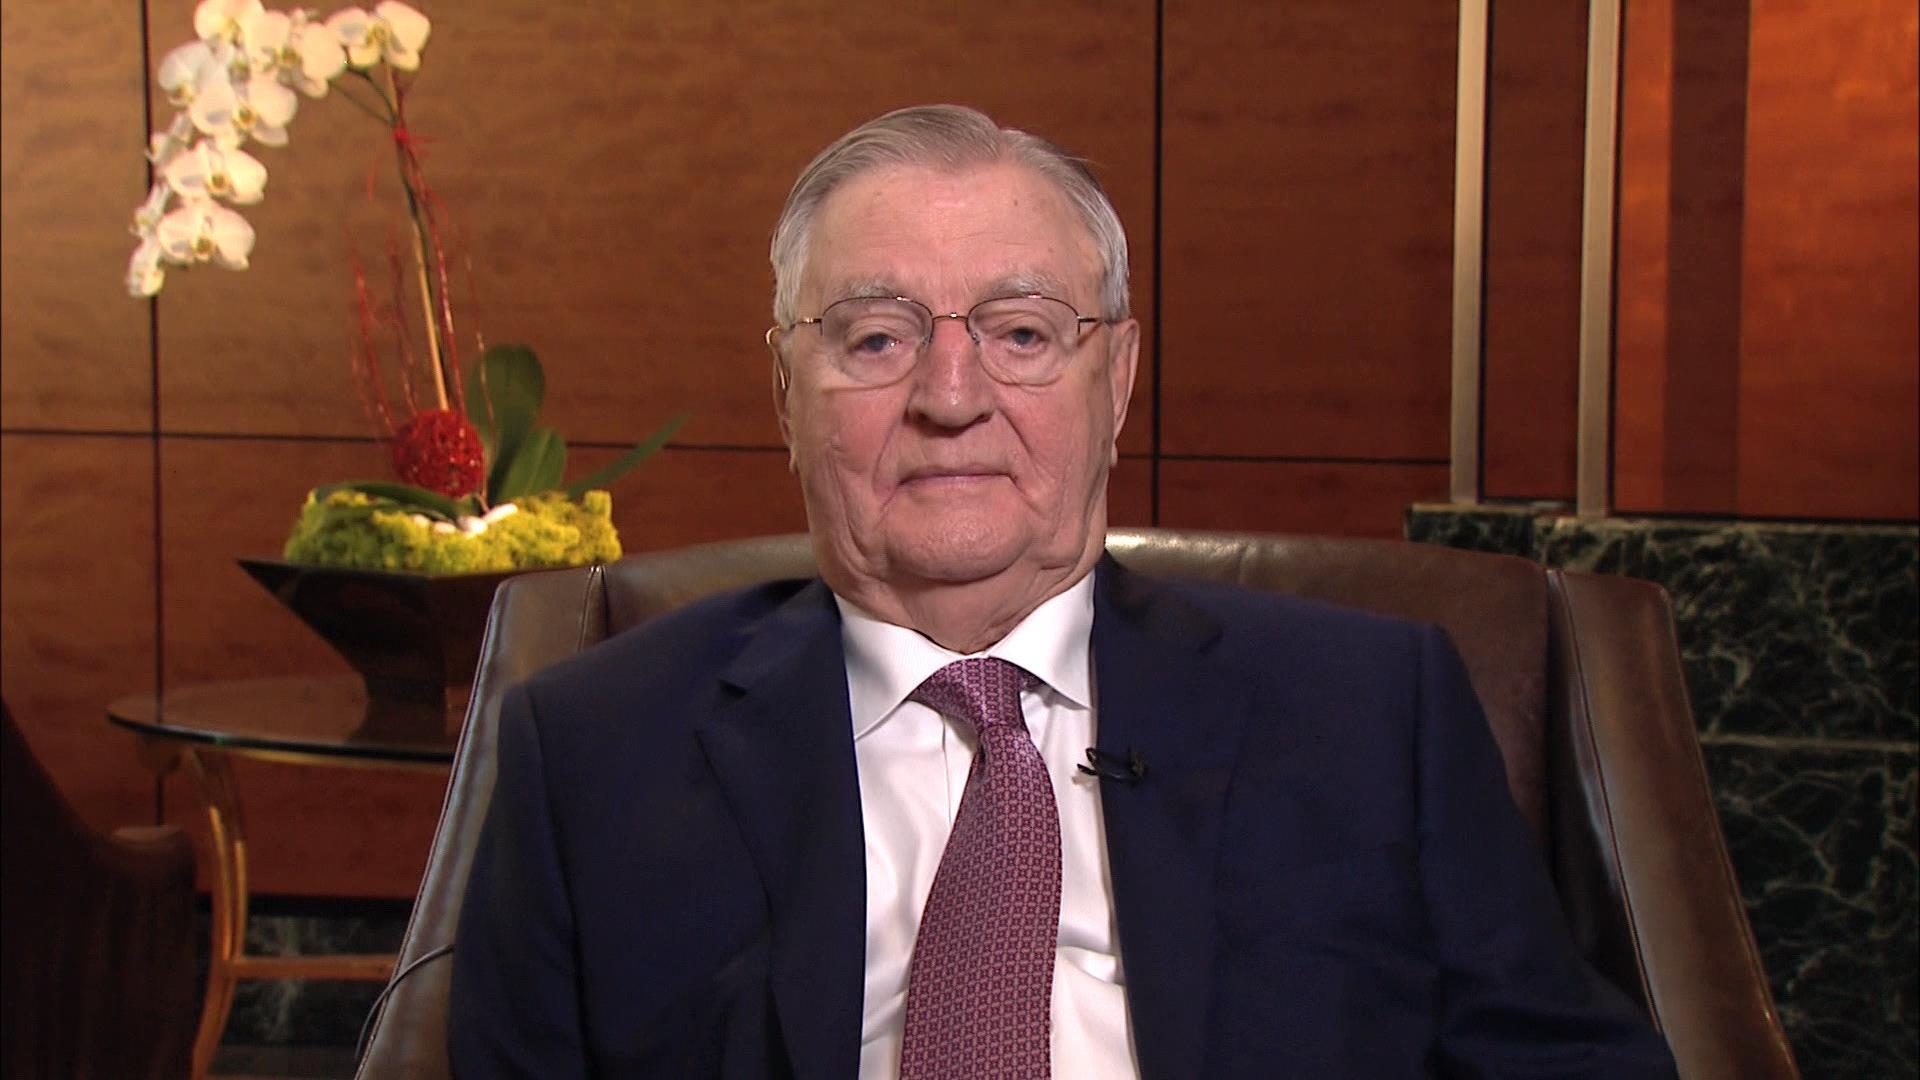 Former VP Mondale on Nuclear Dangers, Decision 2016